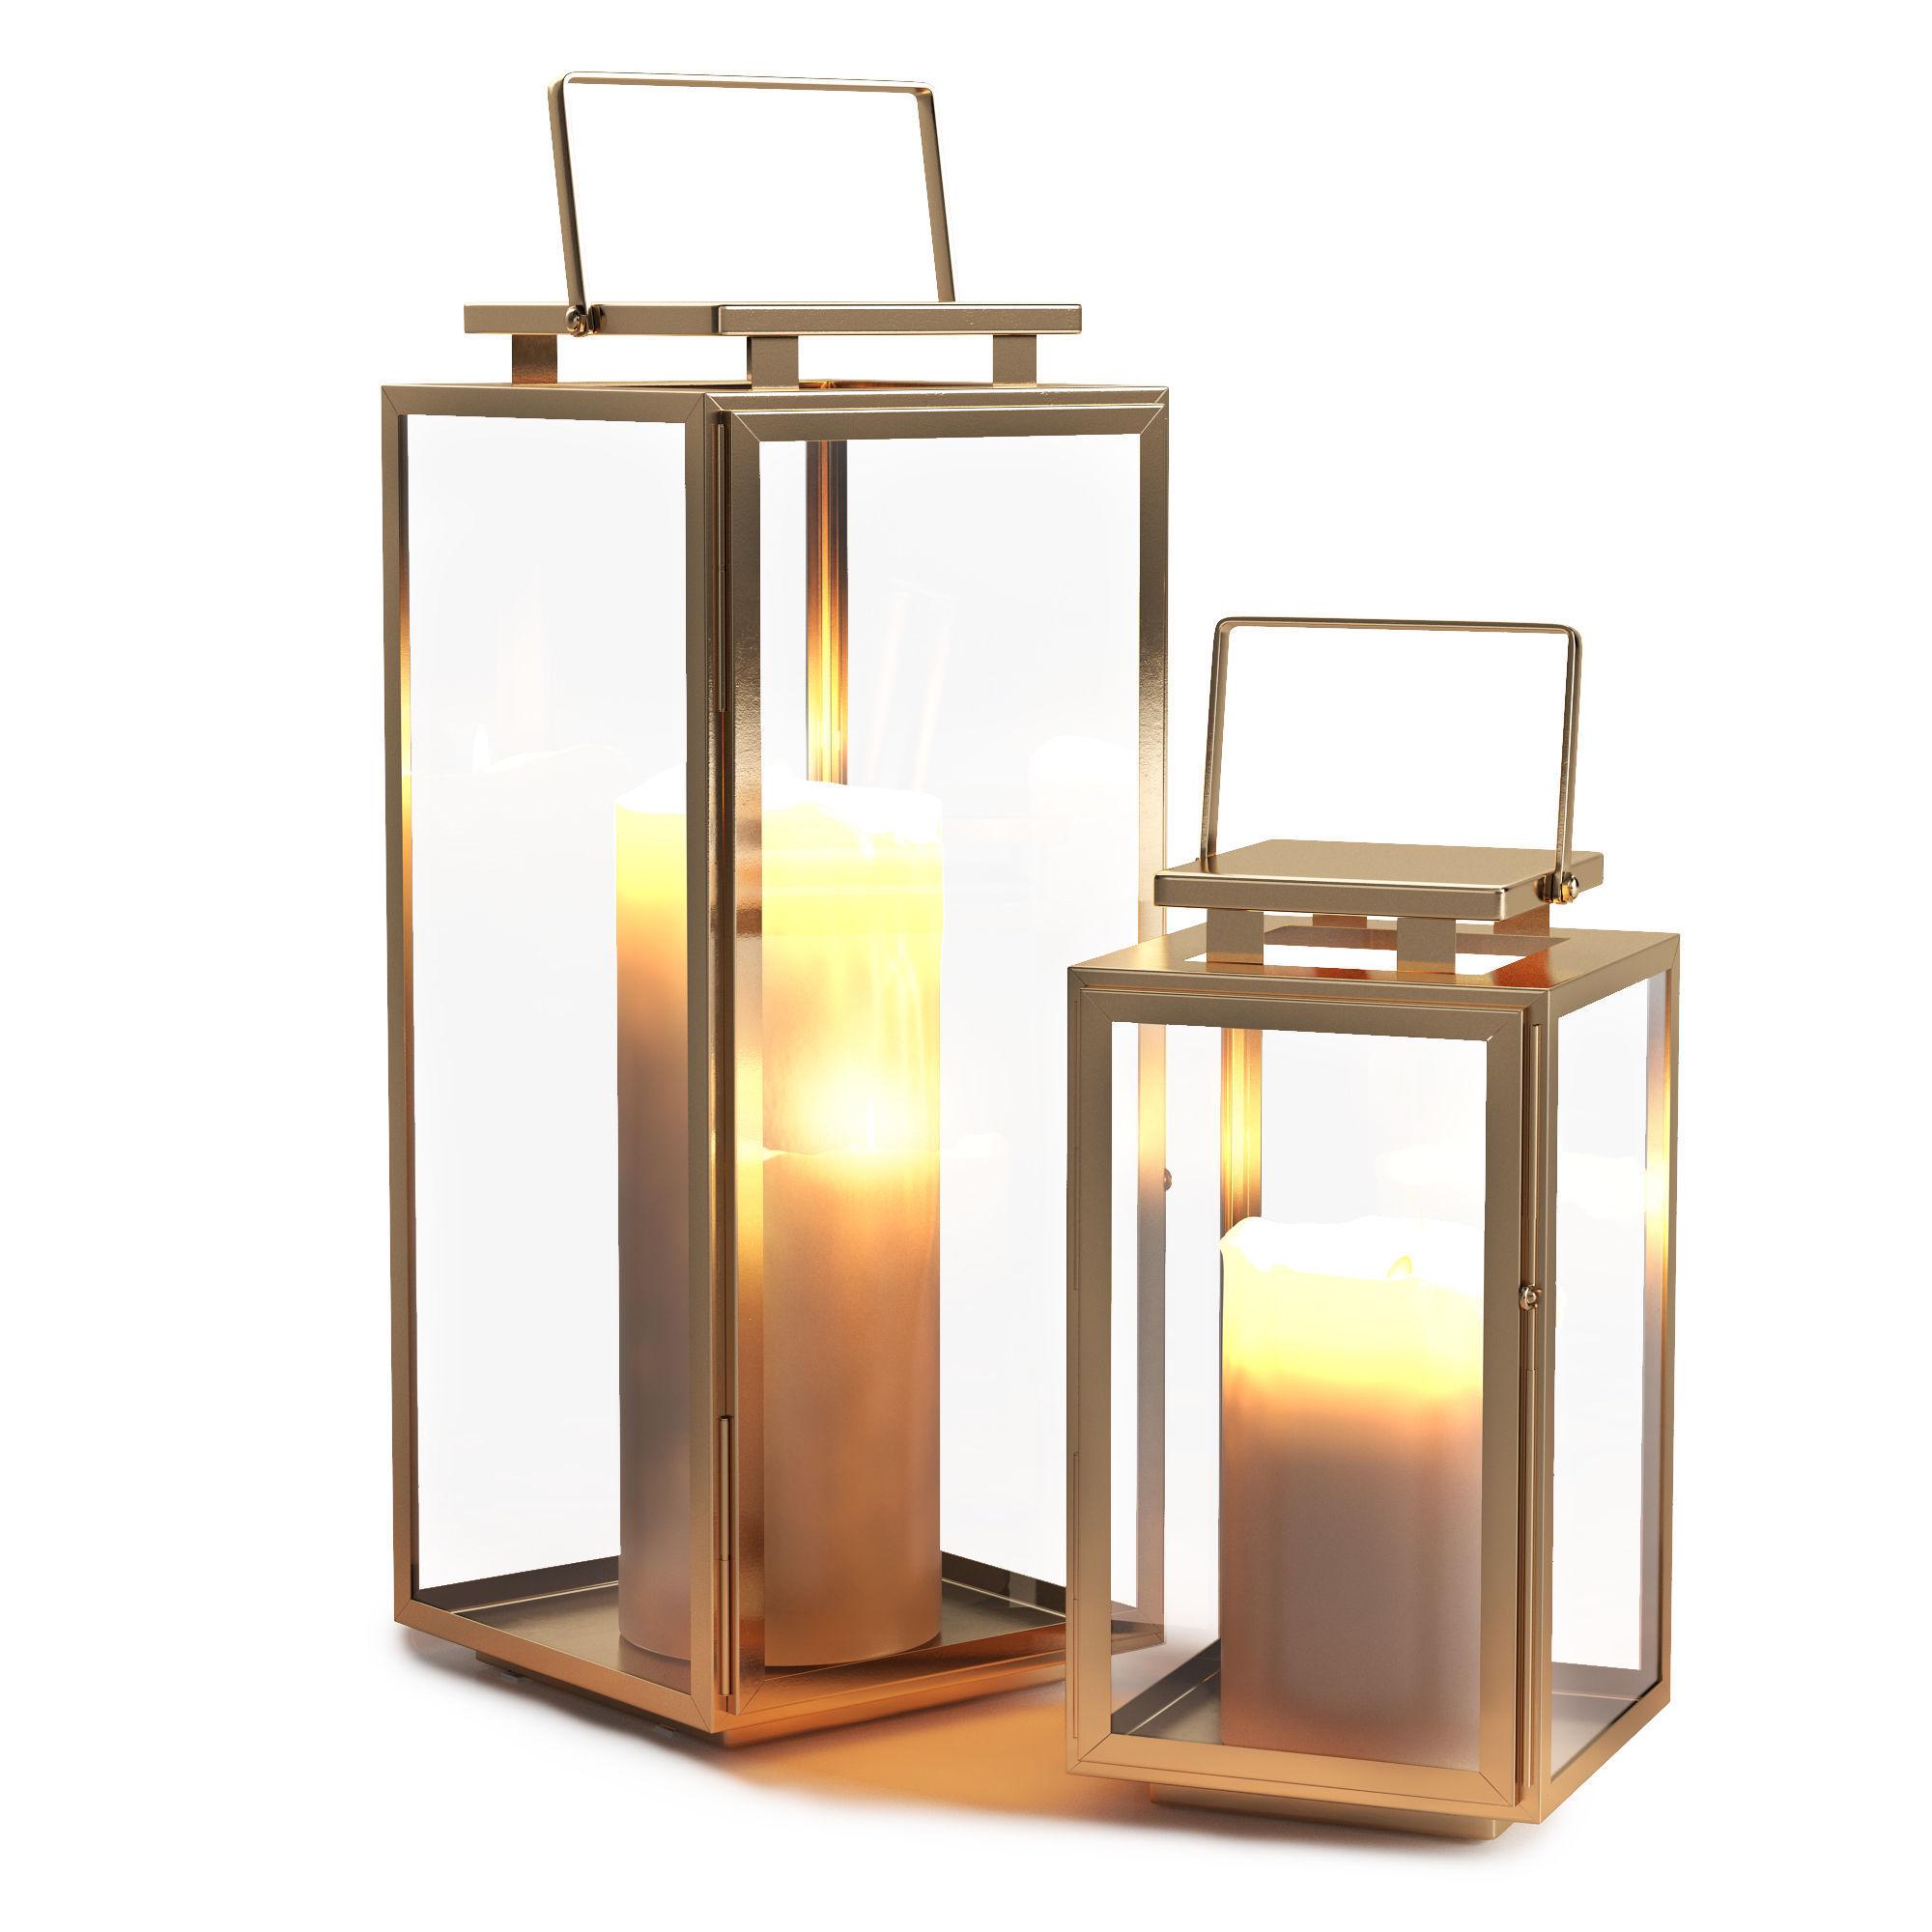 Amalfi lantern - Restoration Hardware